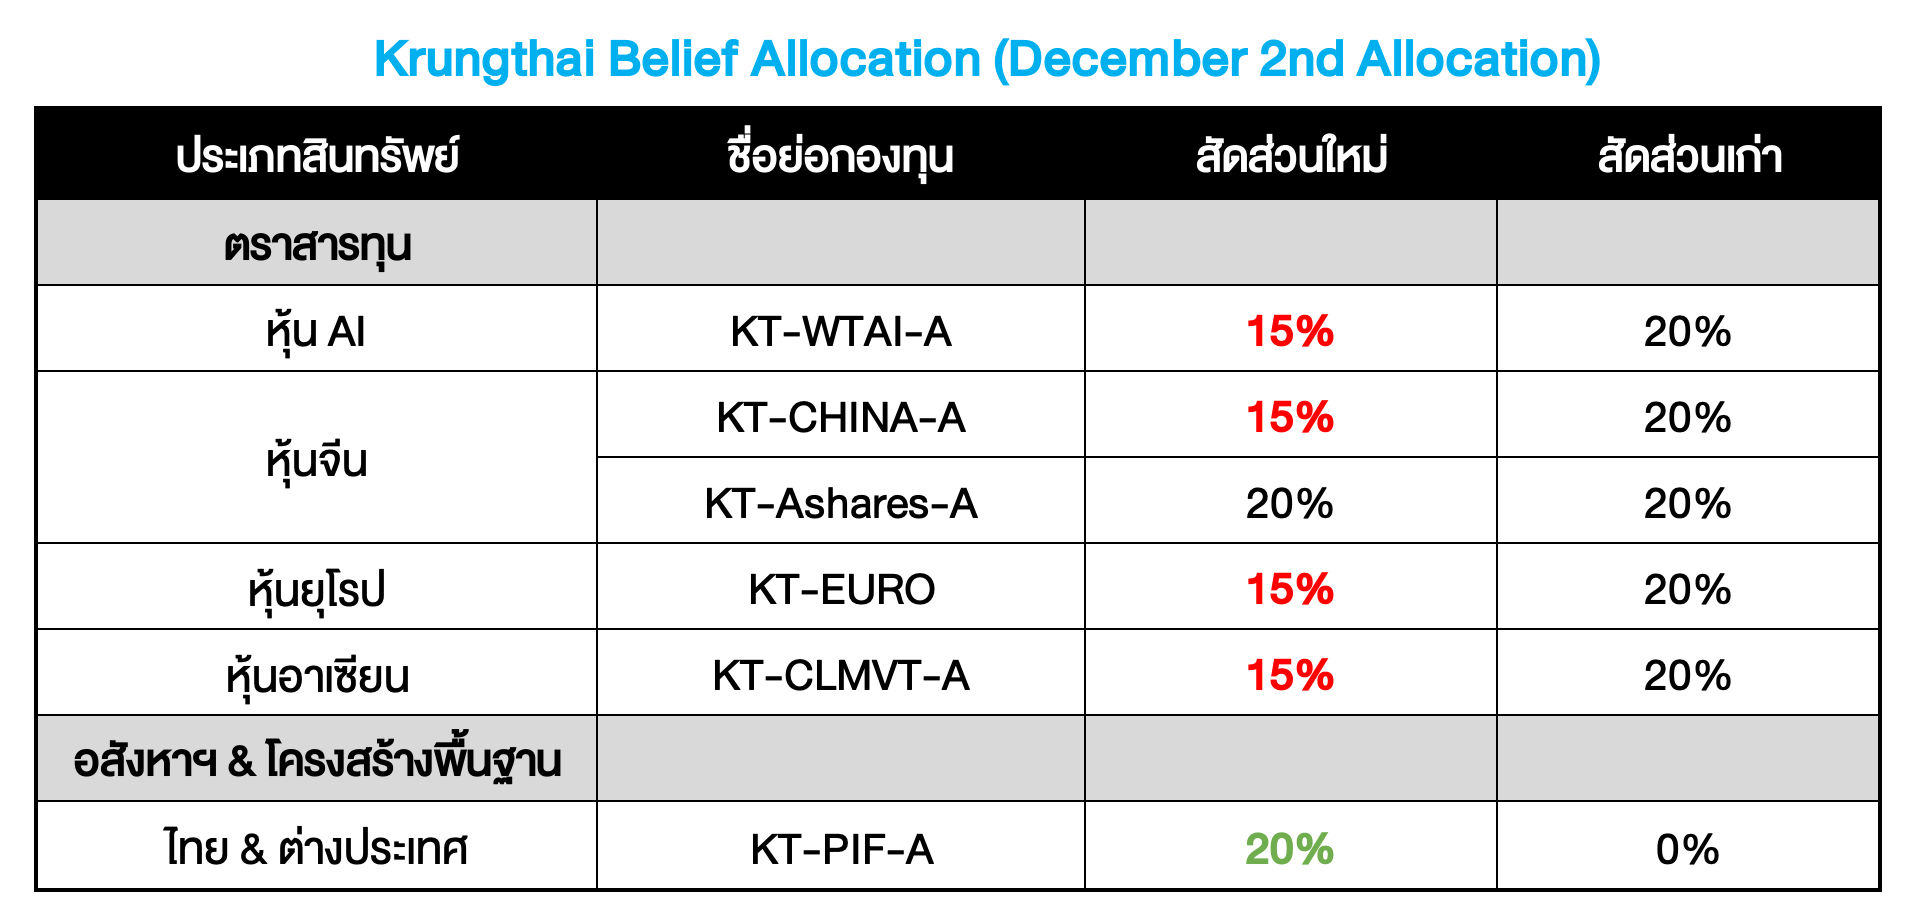 Krungthai Belief Allocation ปรับพอร์ตเดือน ธ.ค. 2020 : KT-PIF #Refresh